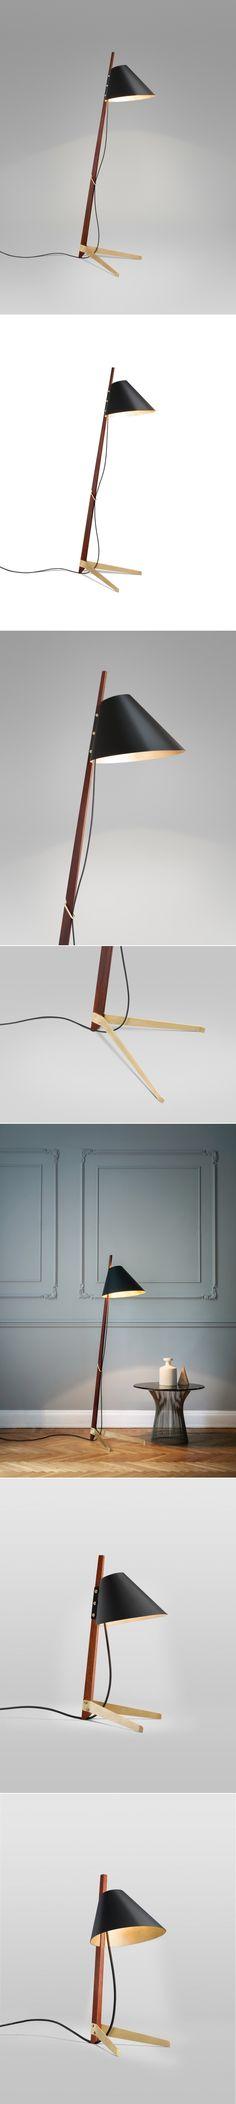 Studioilse Designs Lamp for Kalmar Werkstätten - Design Milk